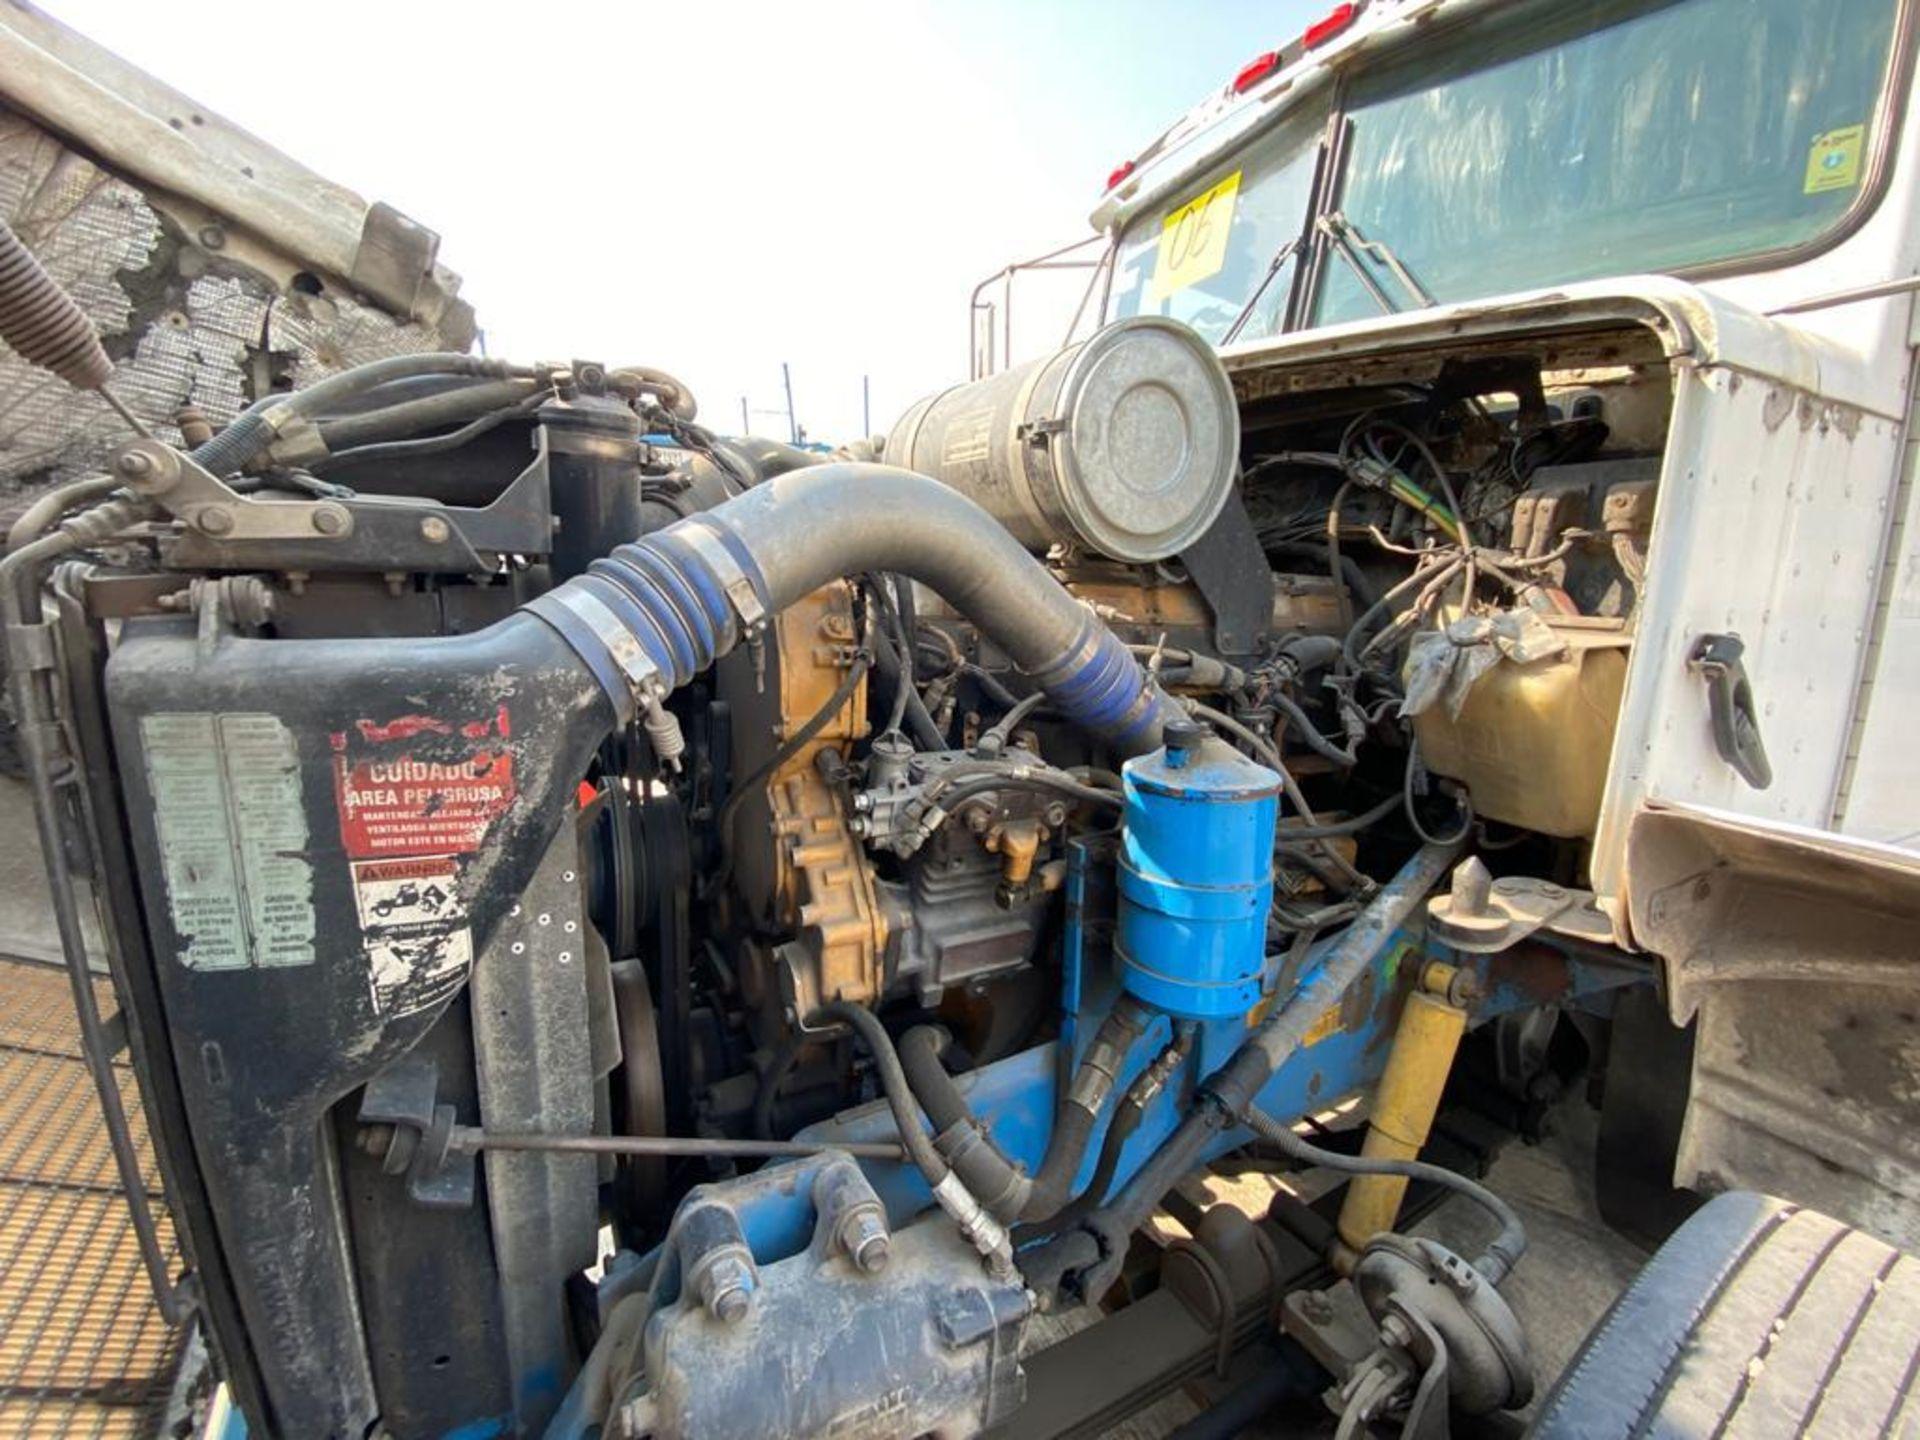 1998 Kenworth Sleeper truck tractor, standard transmission of 18 speeds - Image 71 of 75